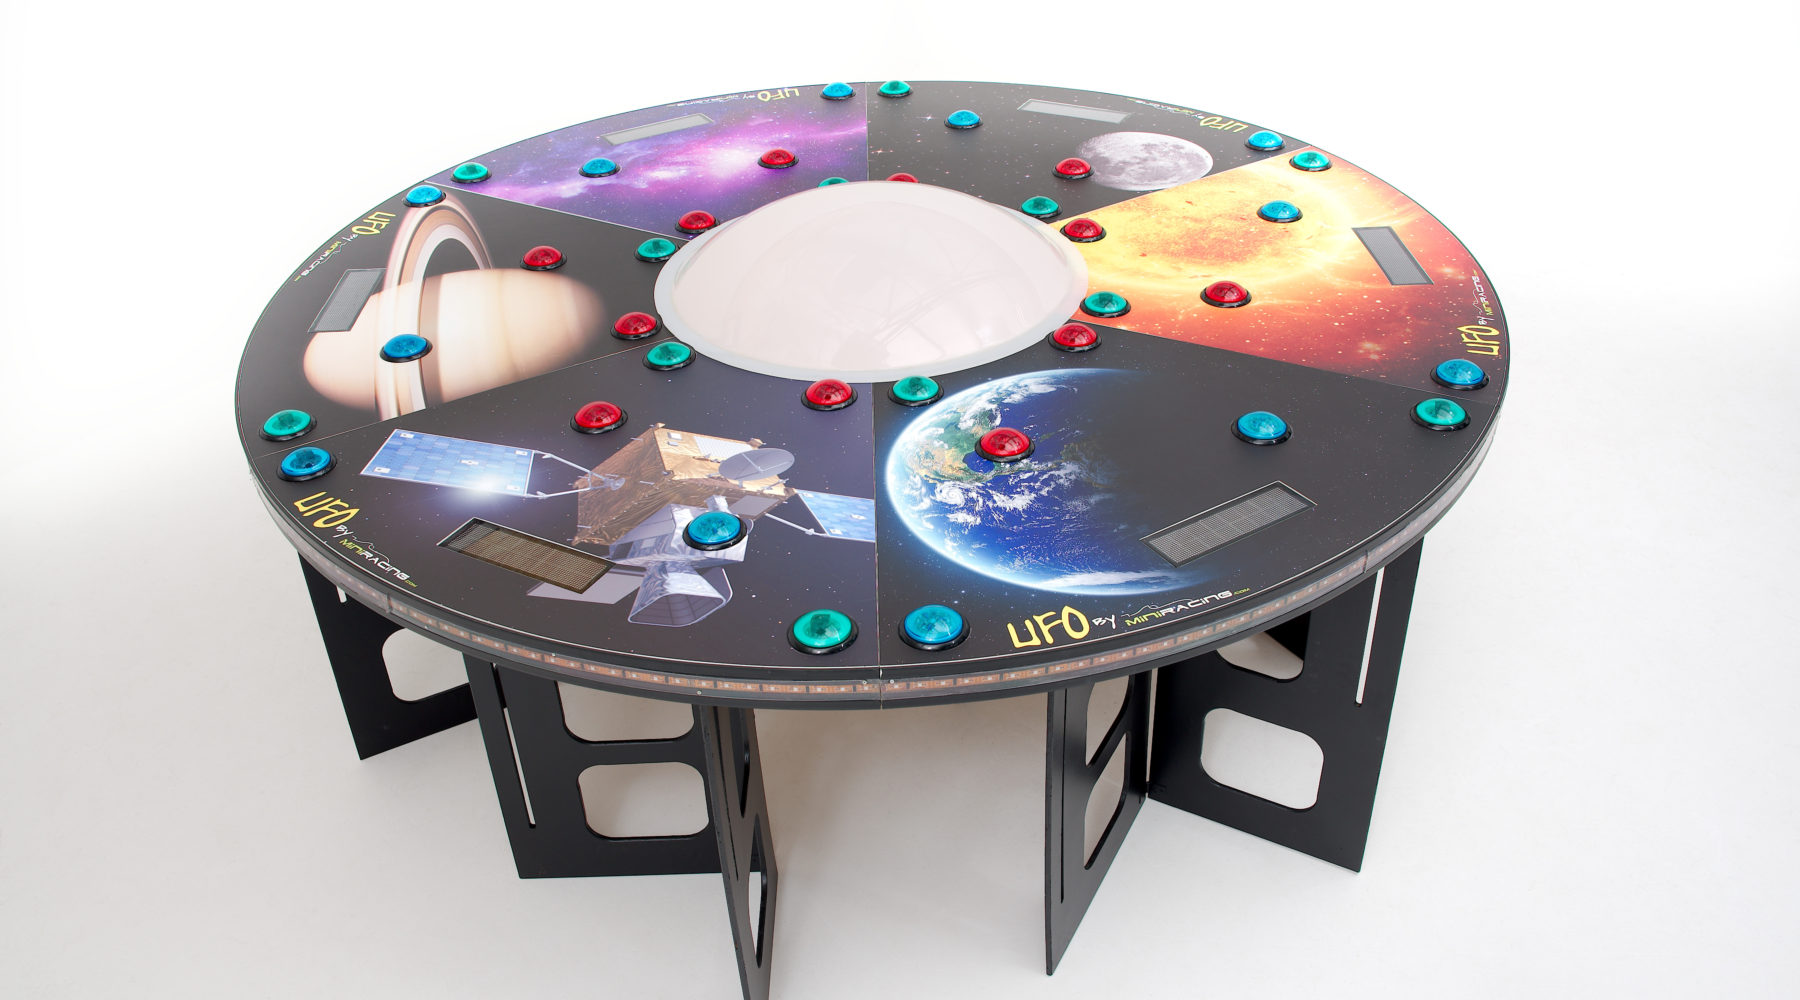 miniracing.com UFO reaction game